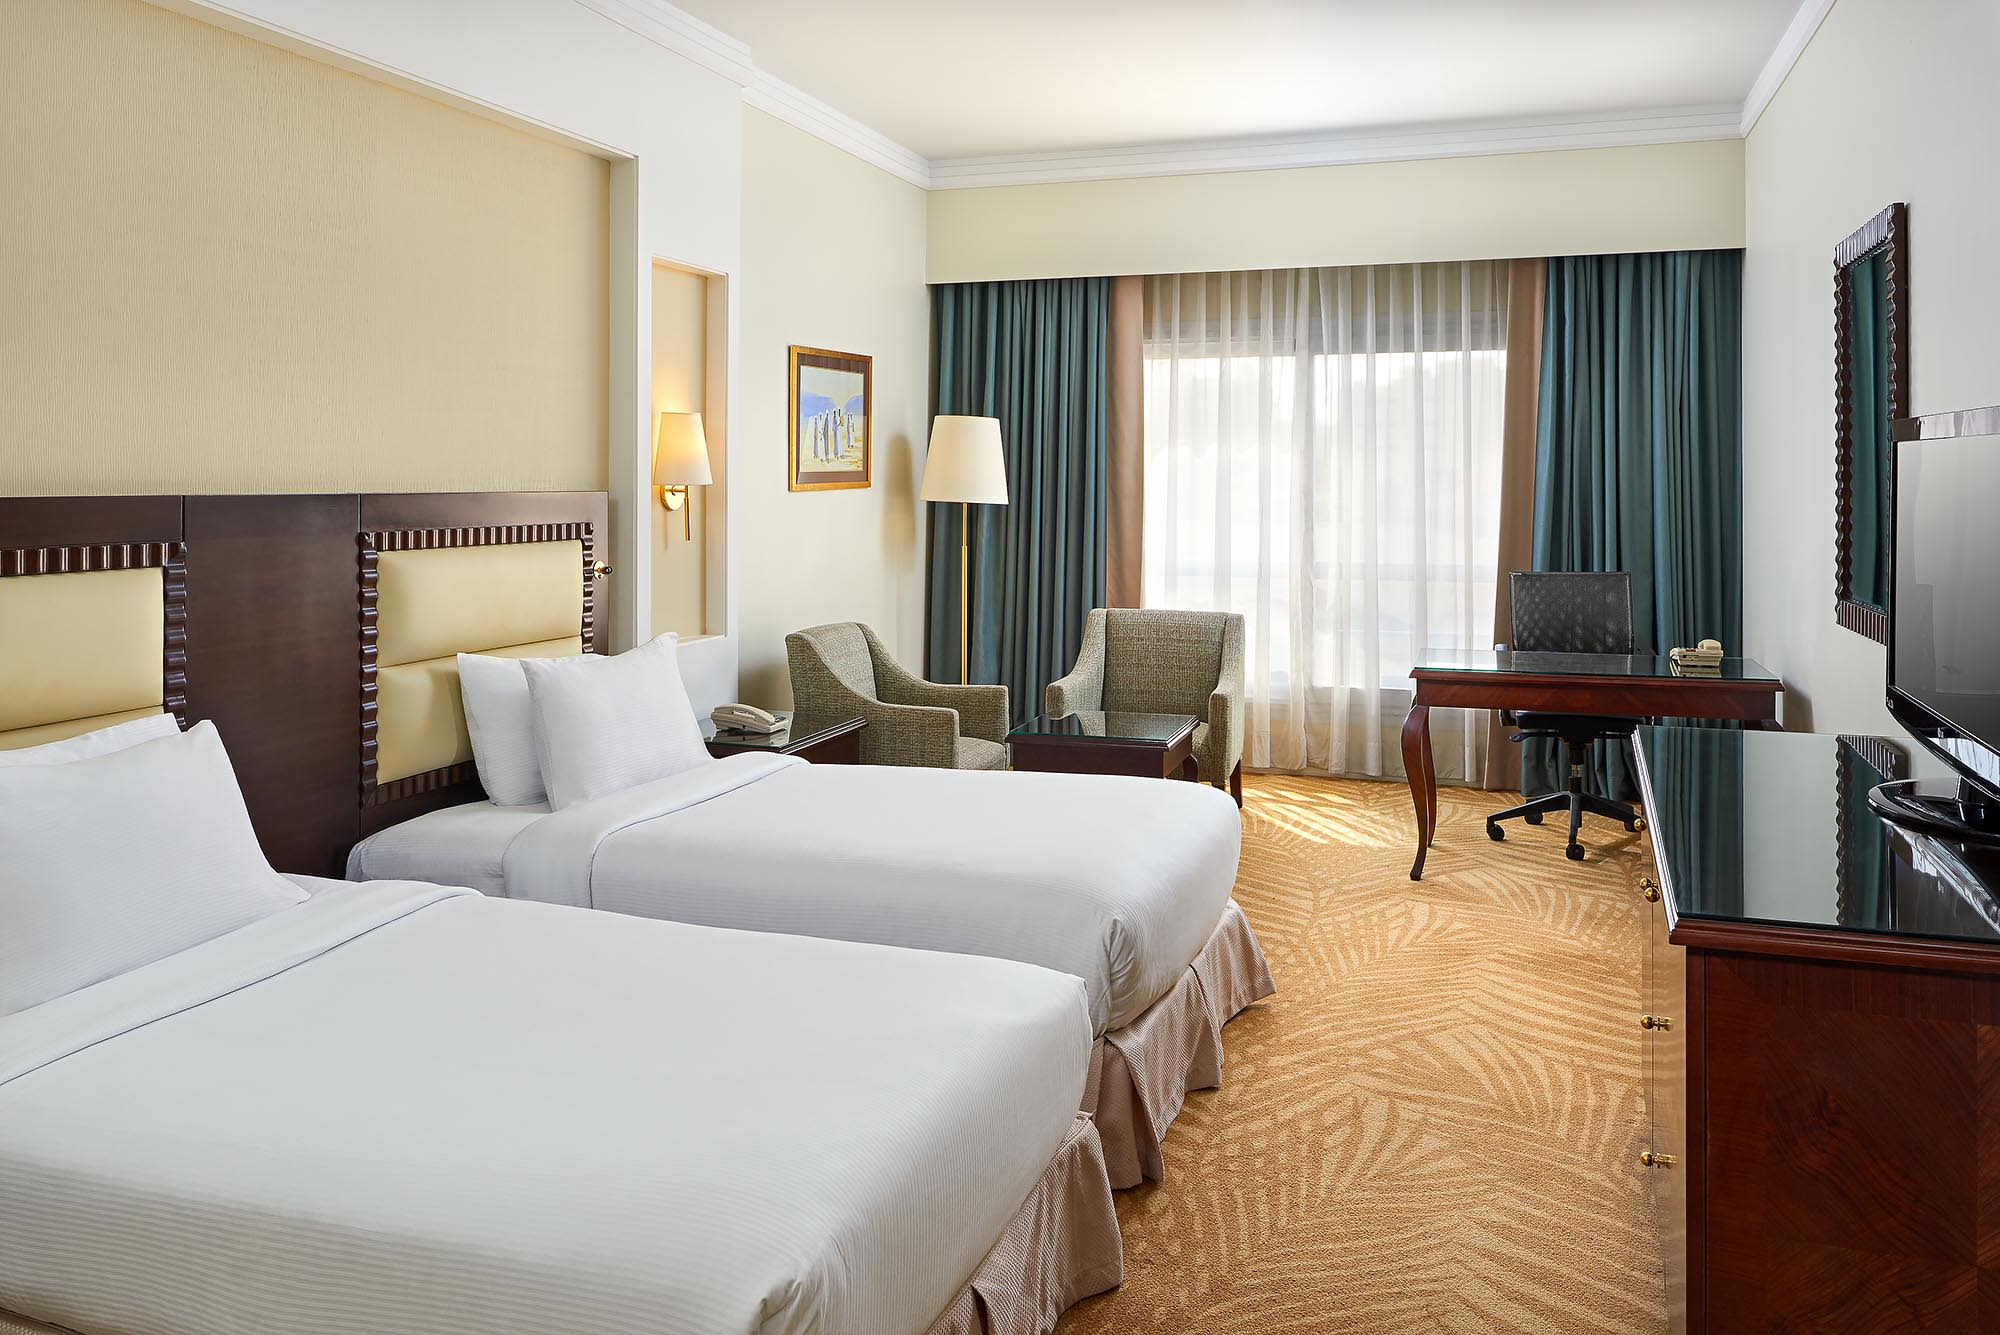 Twin Bedroom Guestroom - Hilton Alexandria Green Plaza - Mohamed Abdel-Hady Photography